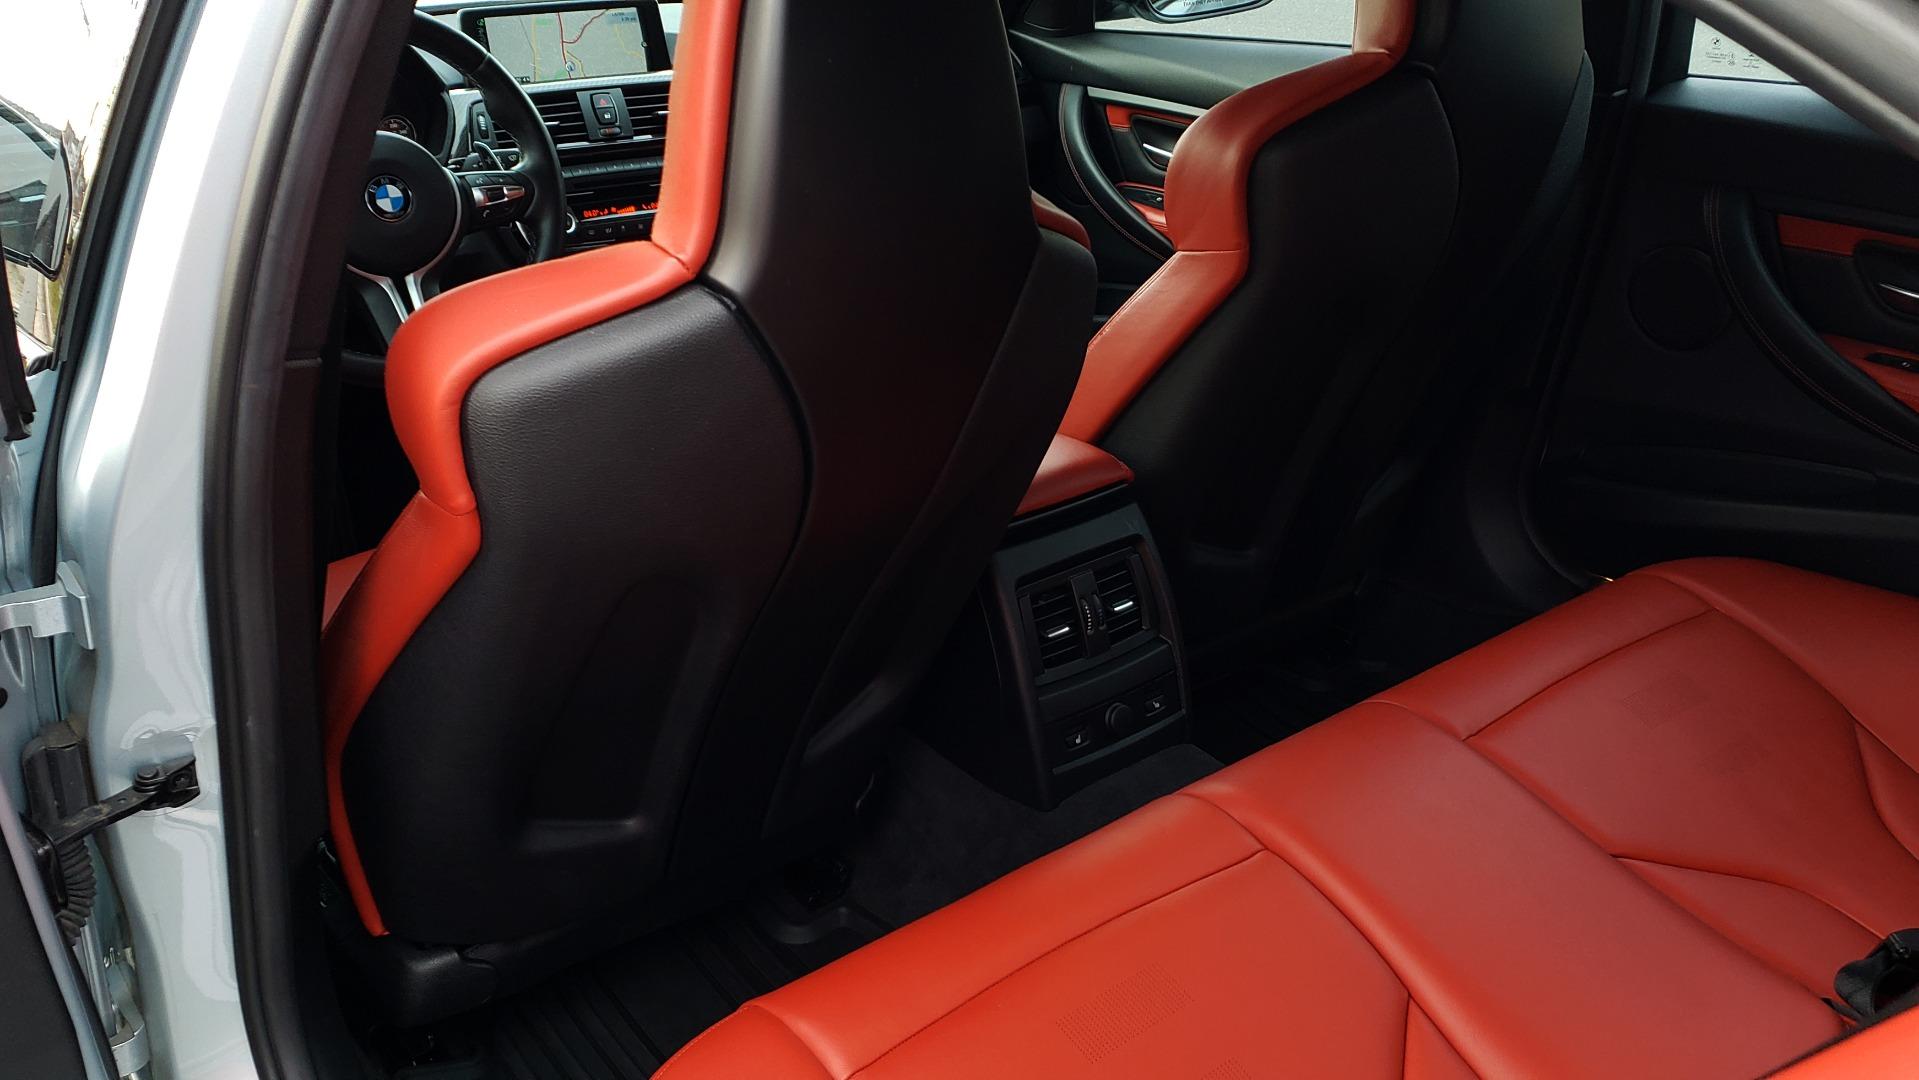 Used 2015 BMW M3 EXECUTIVE PKG / NAV / CAMERA / HUD / CARBON FIBER ROOF for sale Sold at Formula Imports in Charlotte NC 28227 73